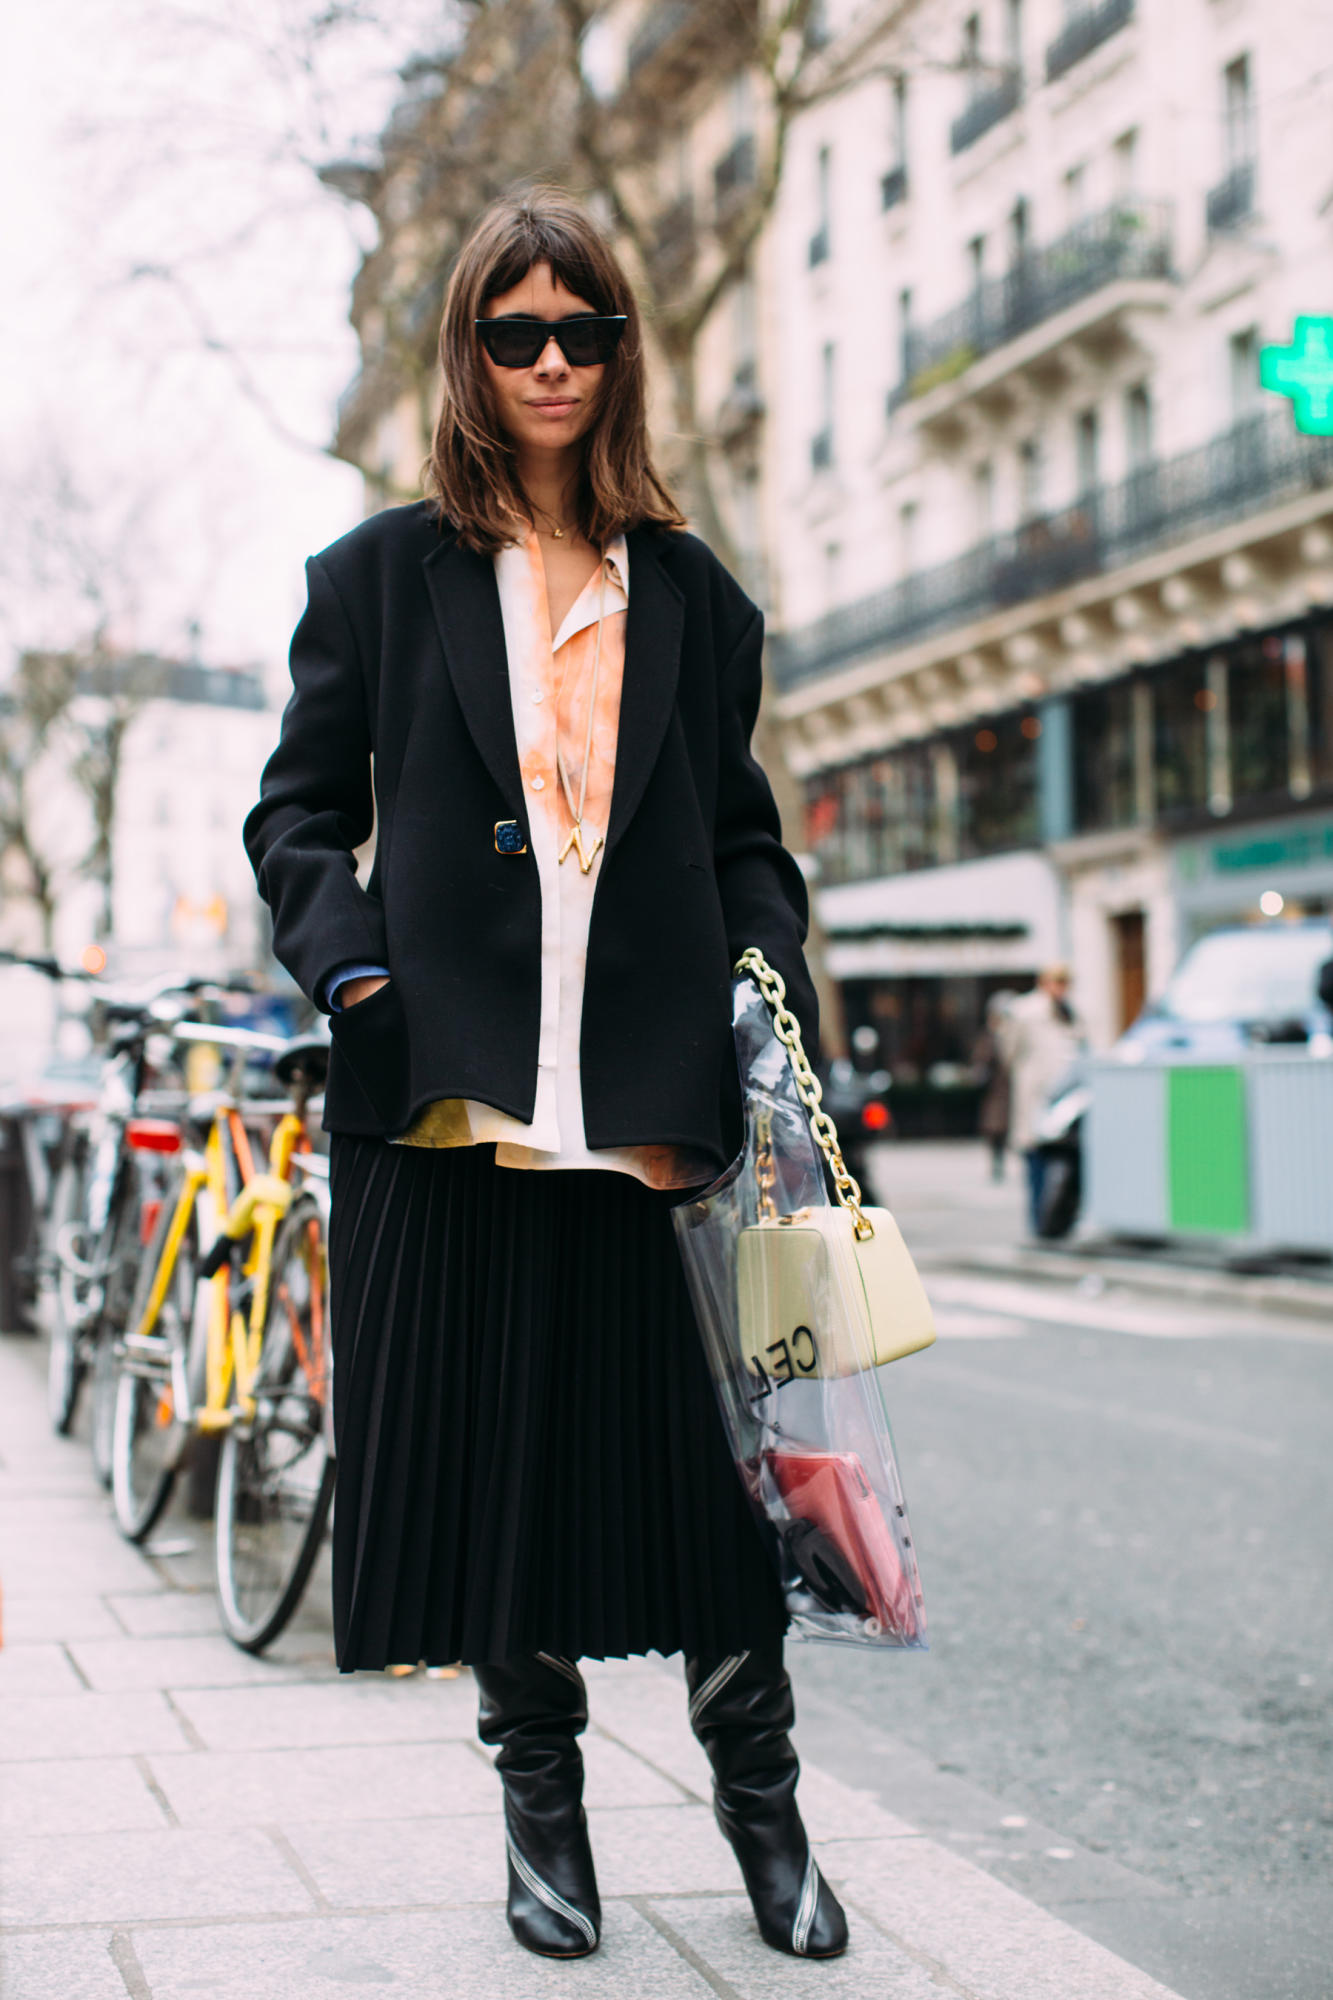 paris-fashion-week-street-style-fall-2018-day-5-57.jpg